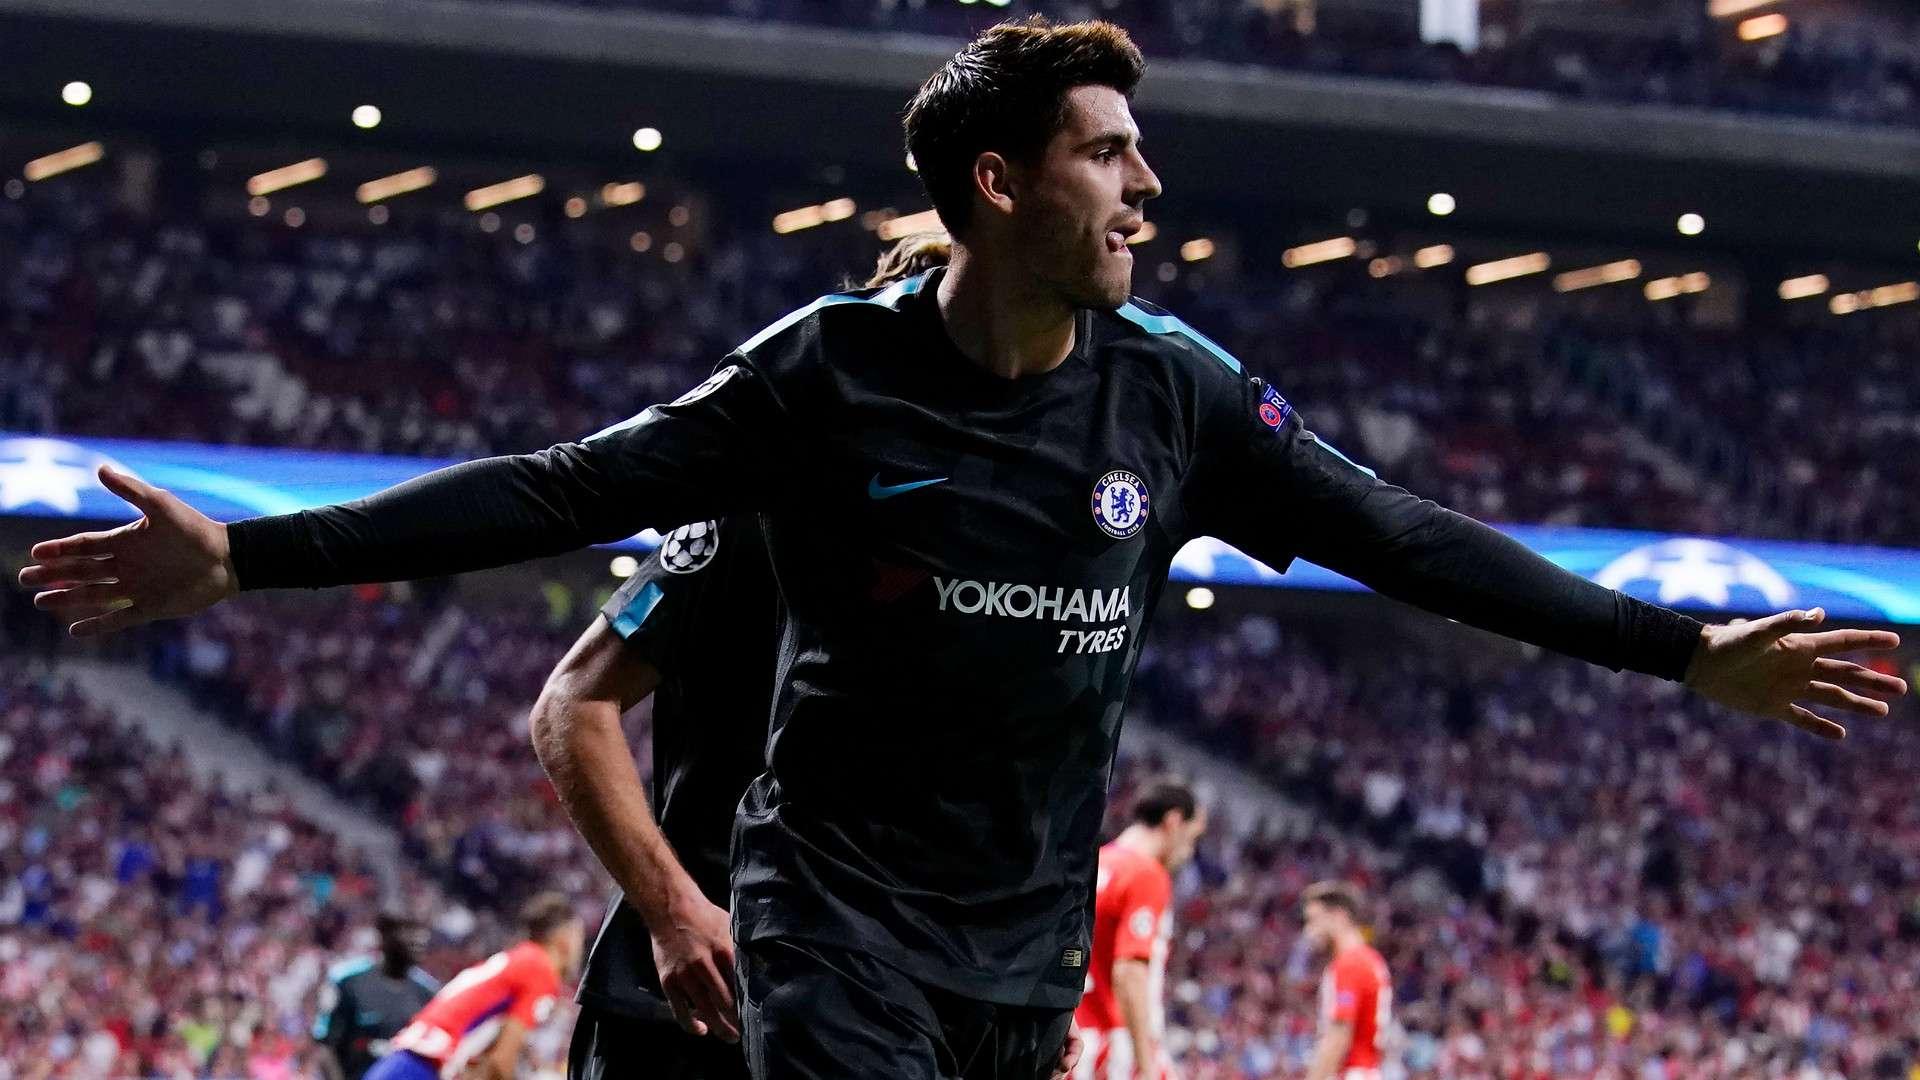 L'Atletico va officialiser Morata et s'attaque à Mandi